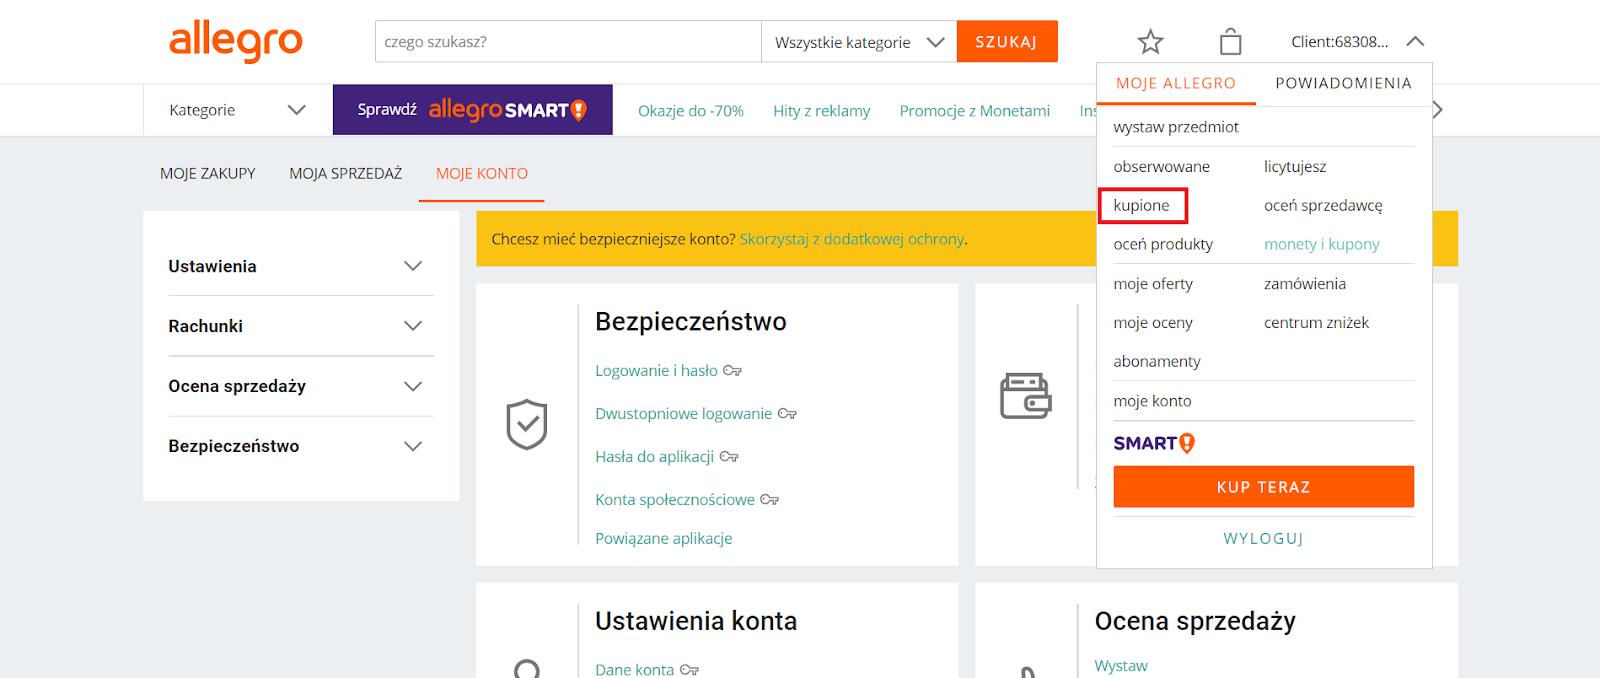 Jak Sledzic Paczke Na Allegro Online Epiotrkow Pl Piotrkow Trybunalski